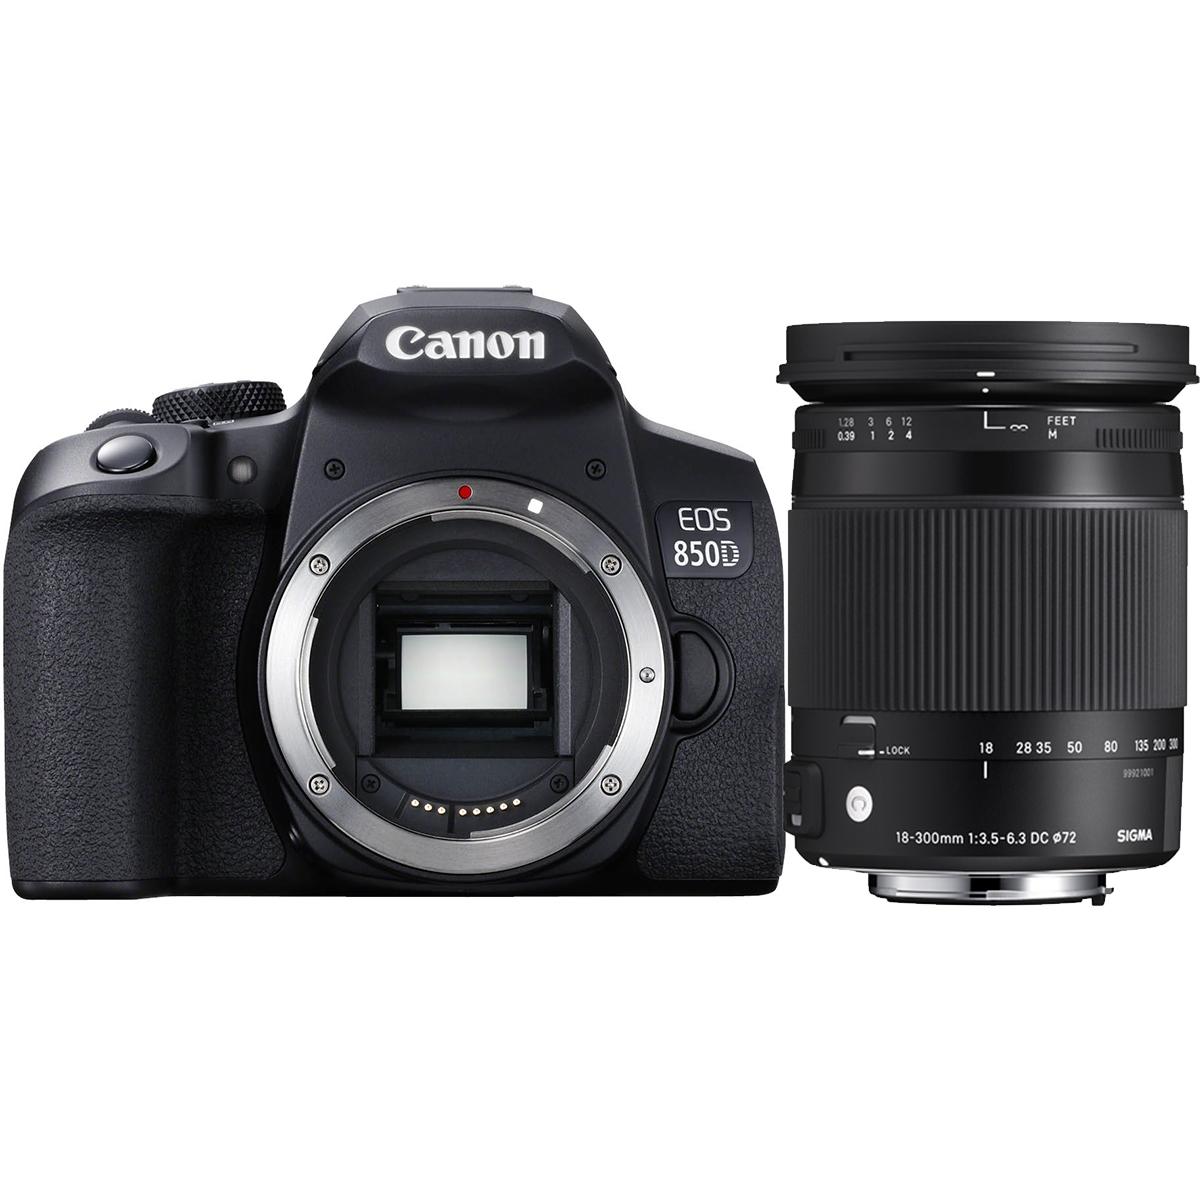 Canon EOS 850D + Sigma 18-300mm 3,5-6,3 DC Makro OS HSM C